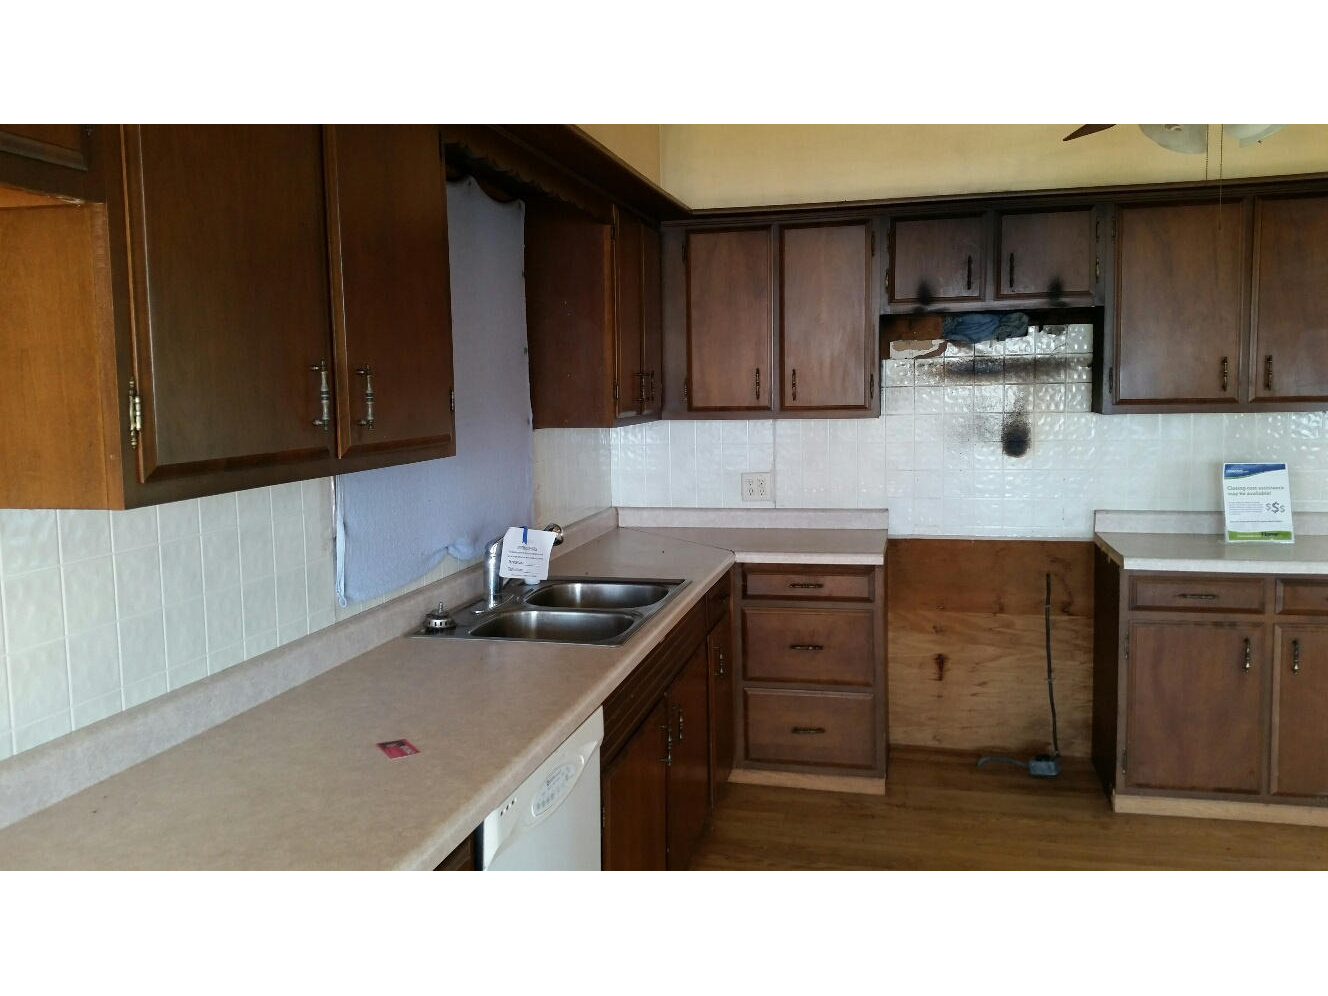 Hannon Kitchen view #2